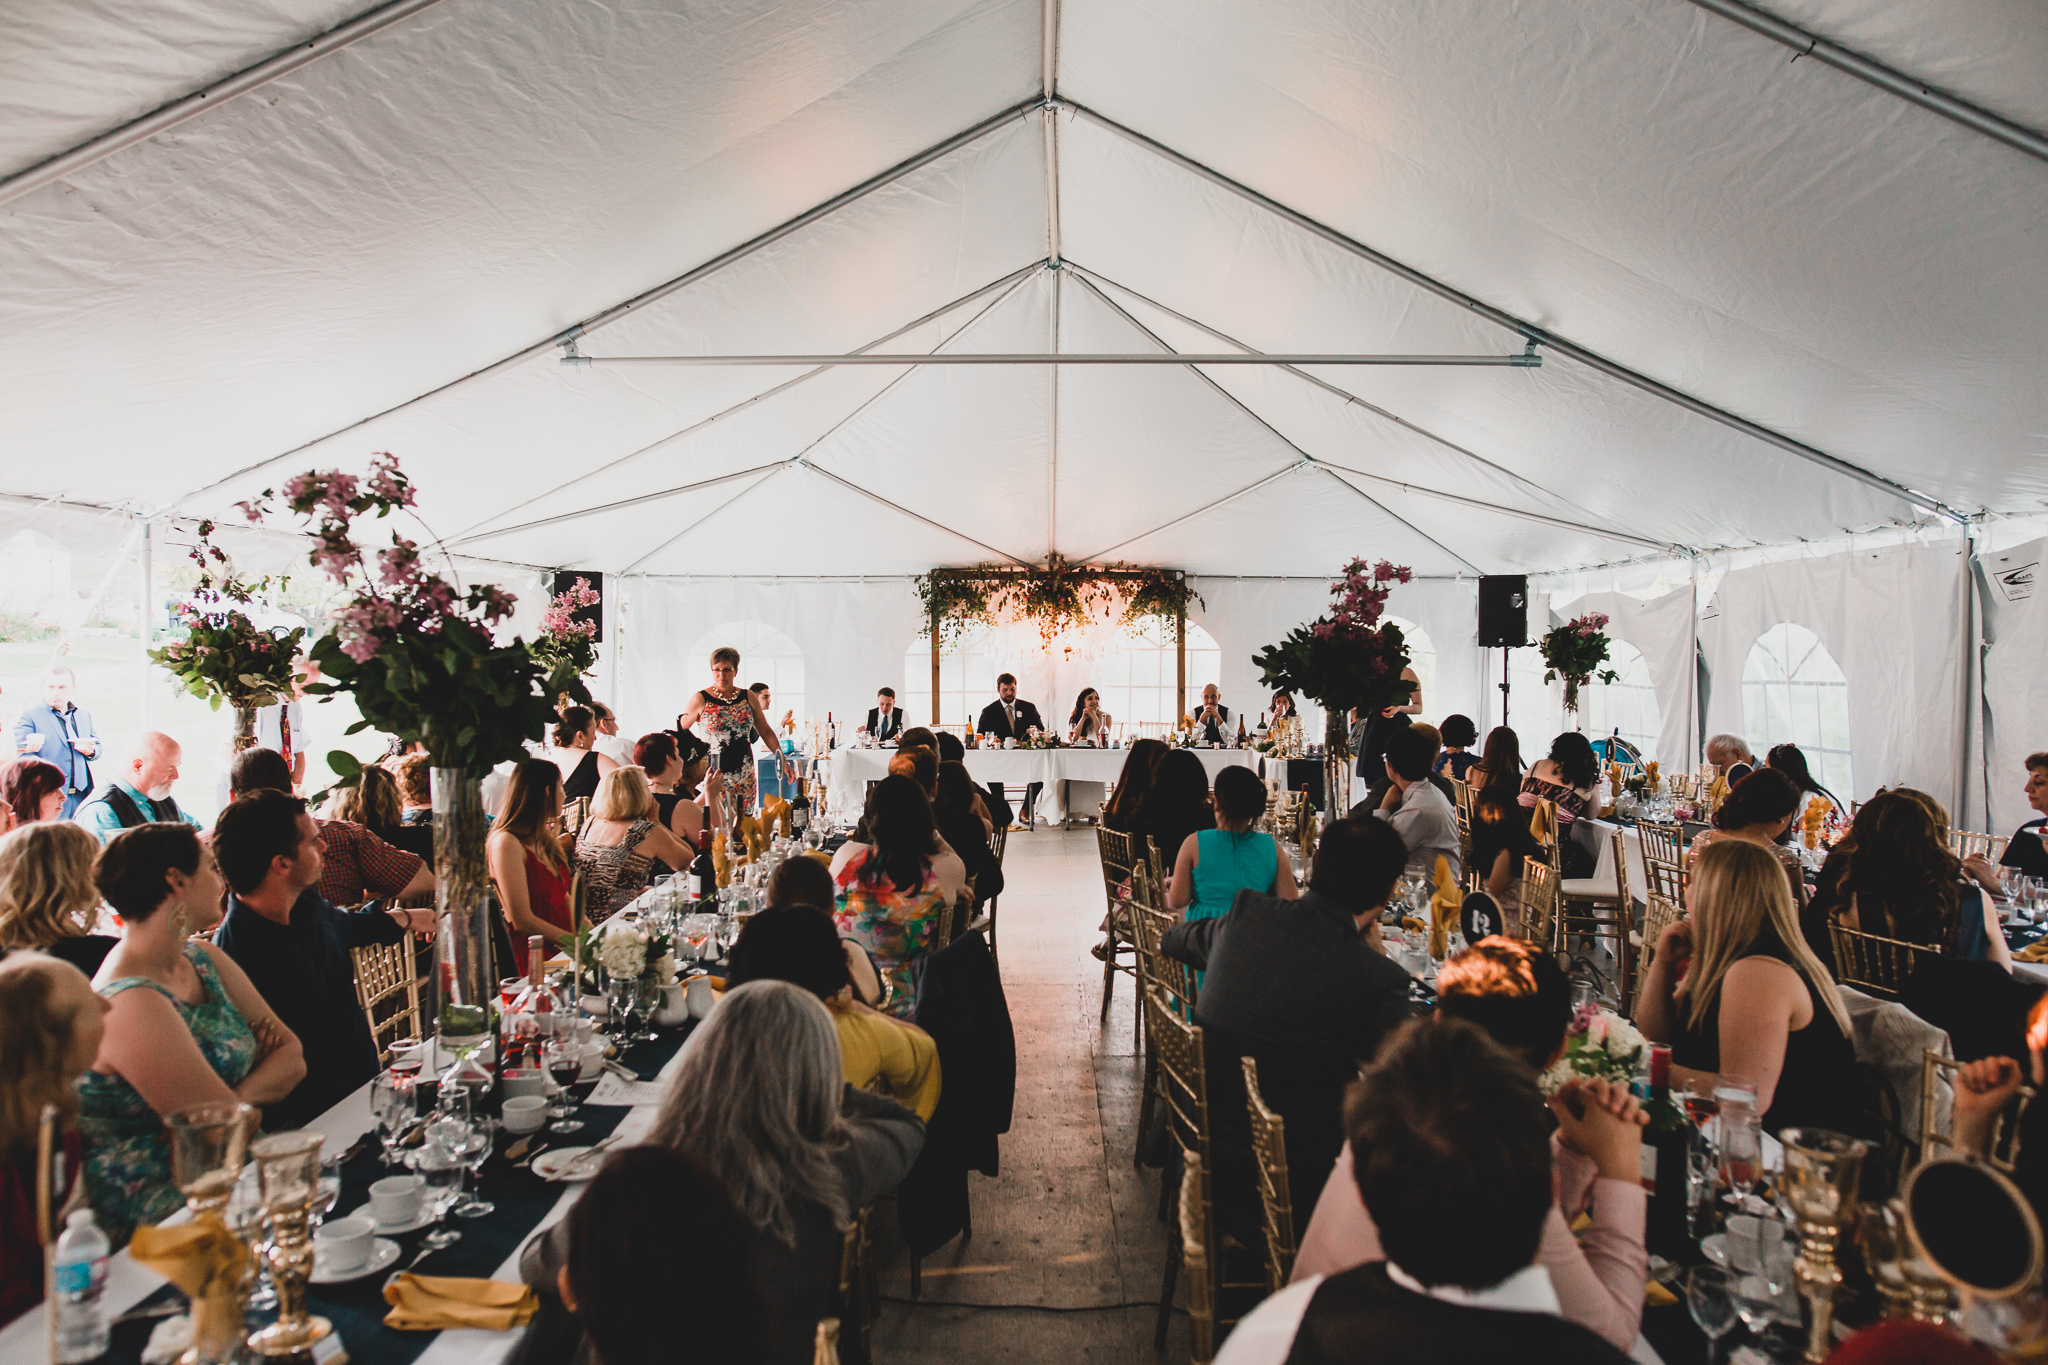 Ottawa tent outdoor wedding venue